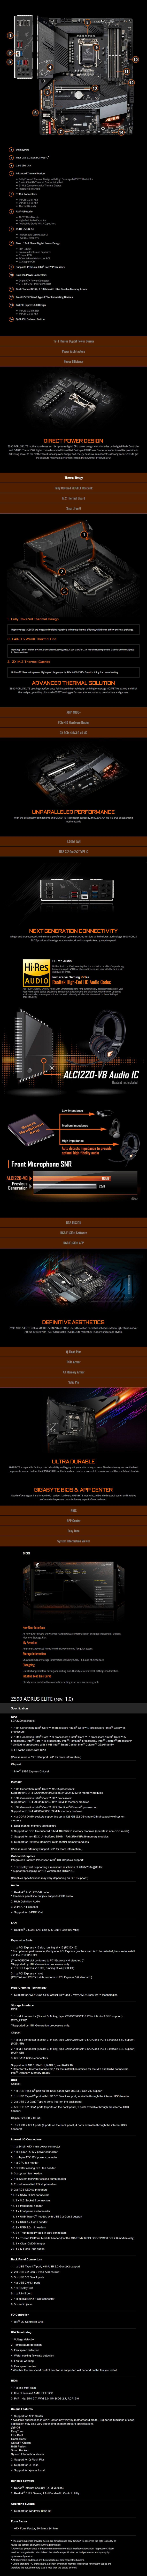 Gigabyte Z590 AORUS ELITE LGA 1200 ATX Motherboard - Overview 1